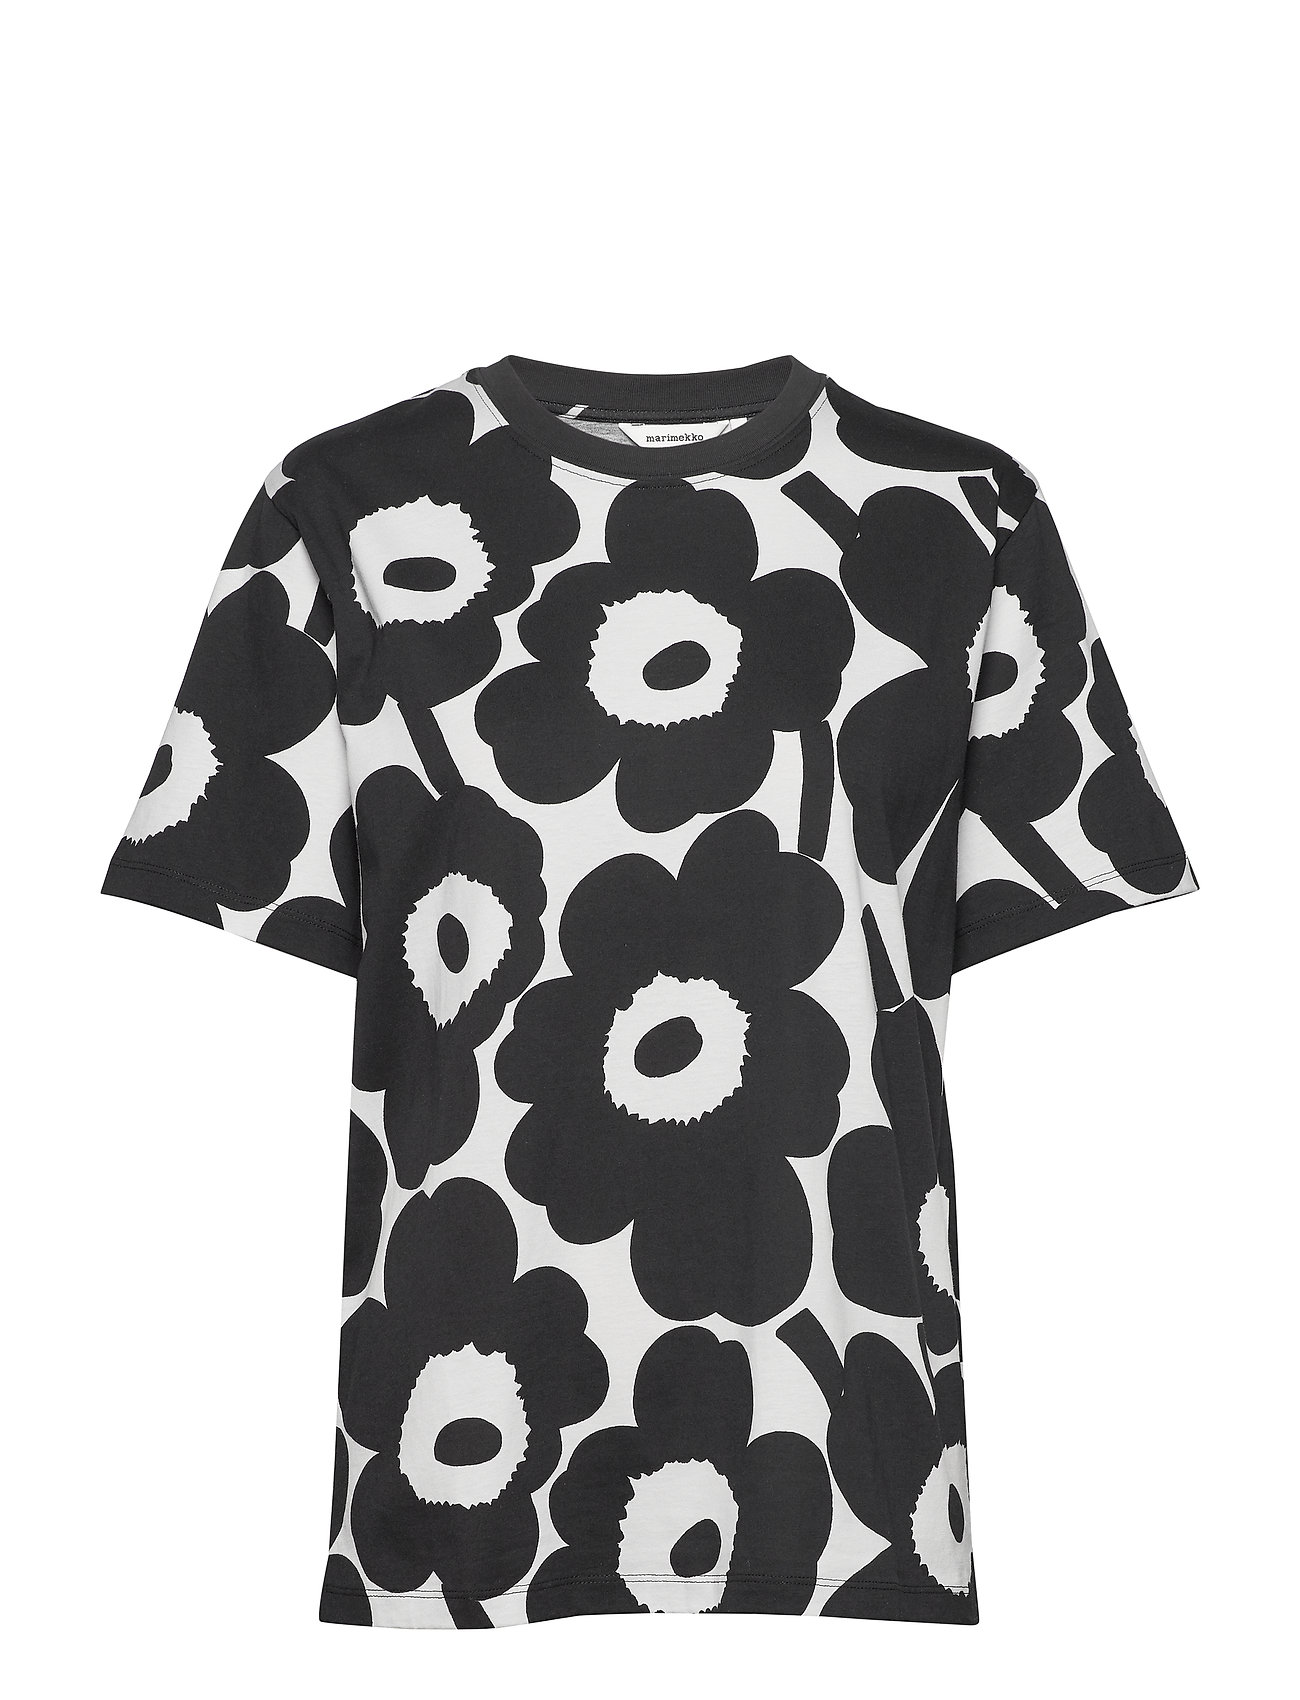 Marimekko HIEKKA PIENI UNIKKO GREY T-shirt - MELANGE GREY, BLACK